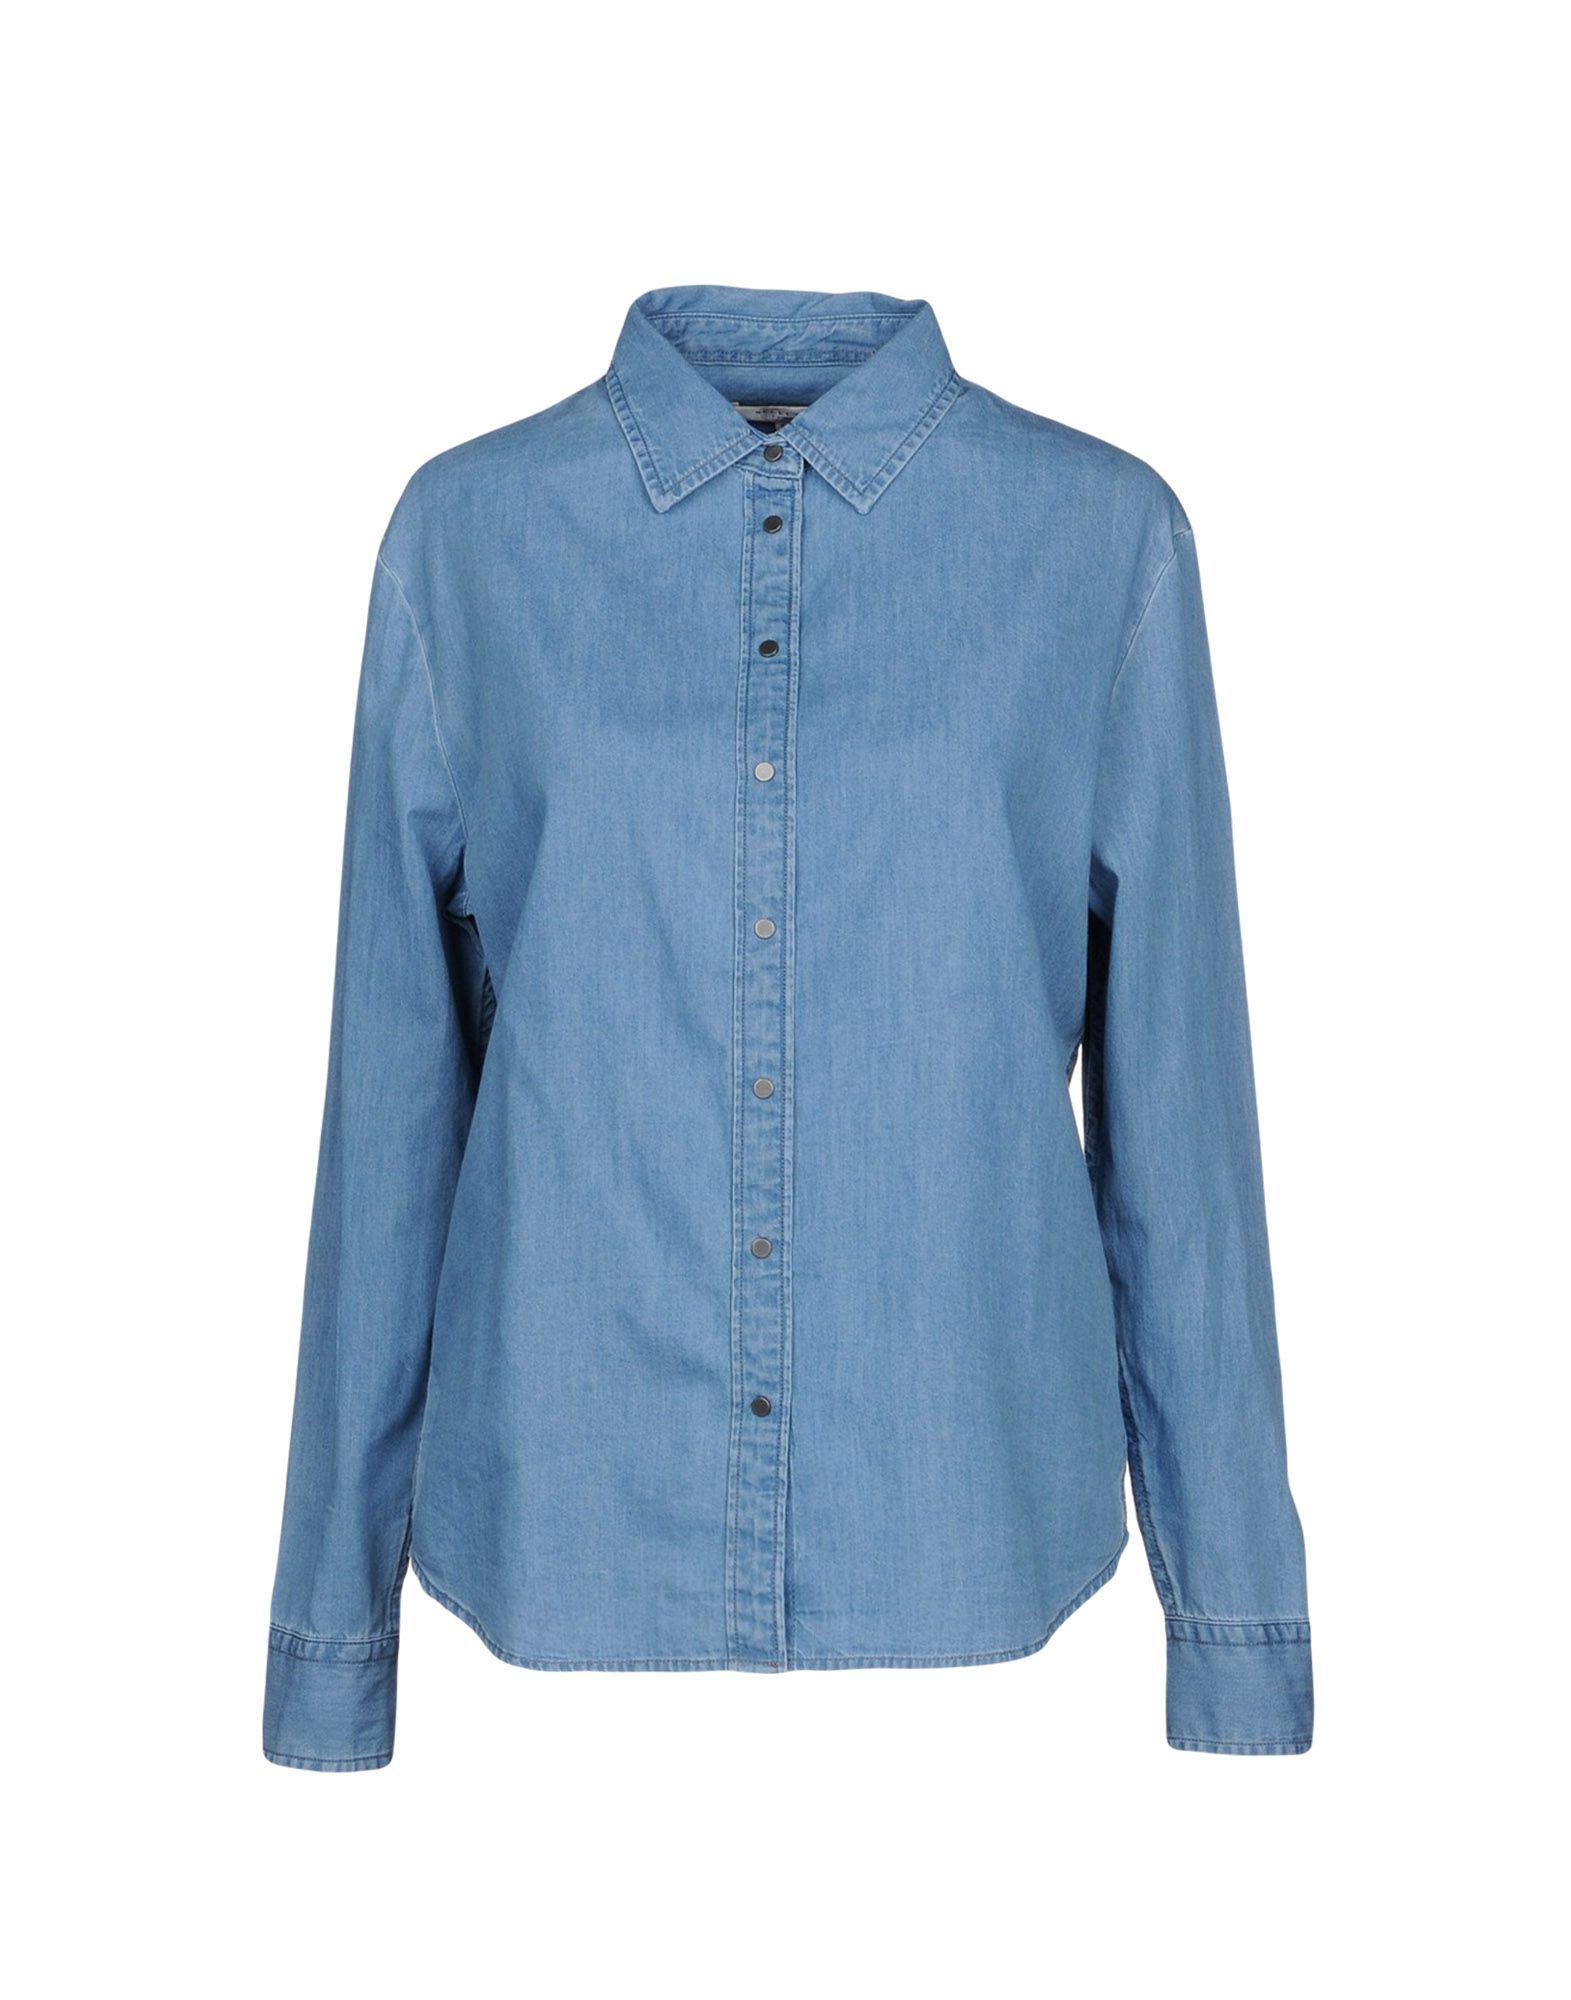 SELECTED FEMME Джинсовая рубашка